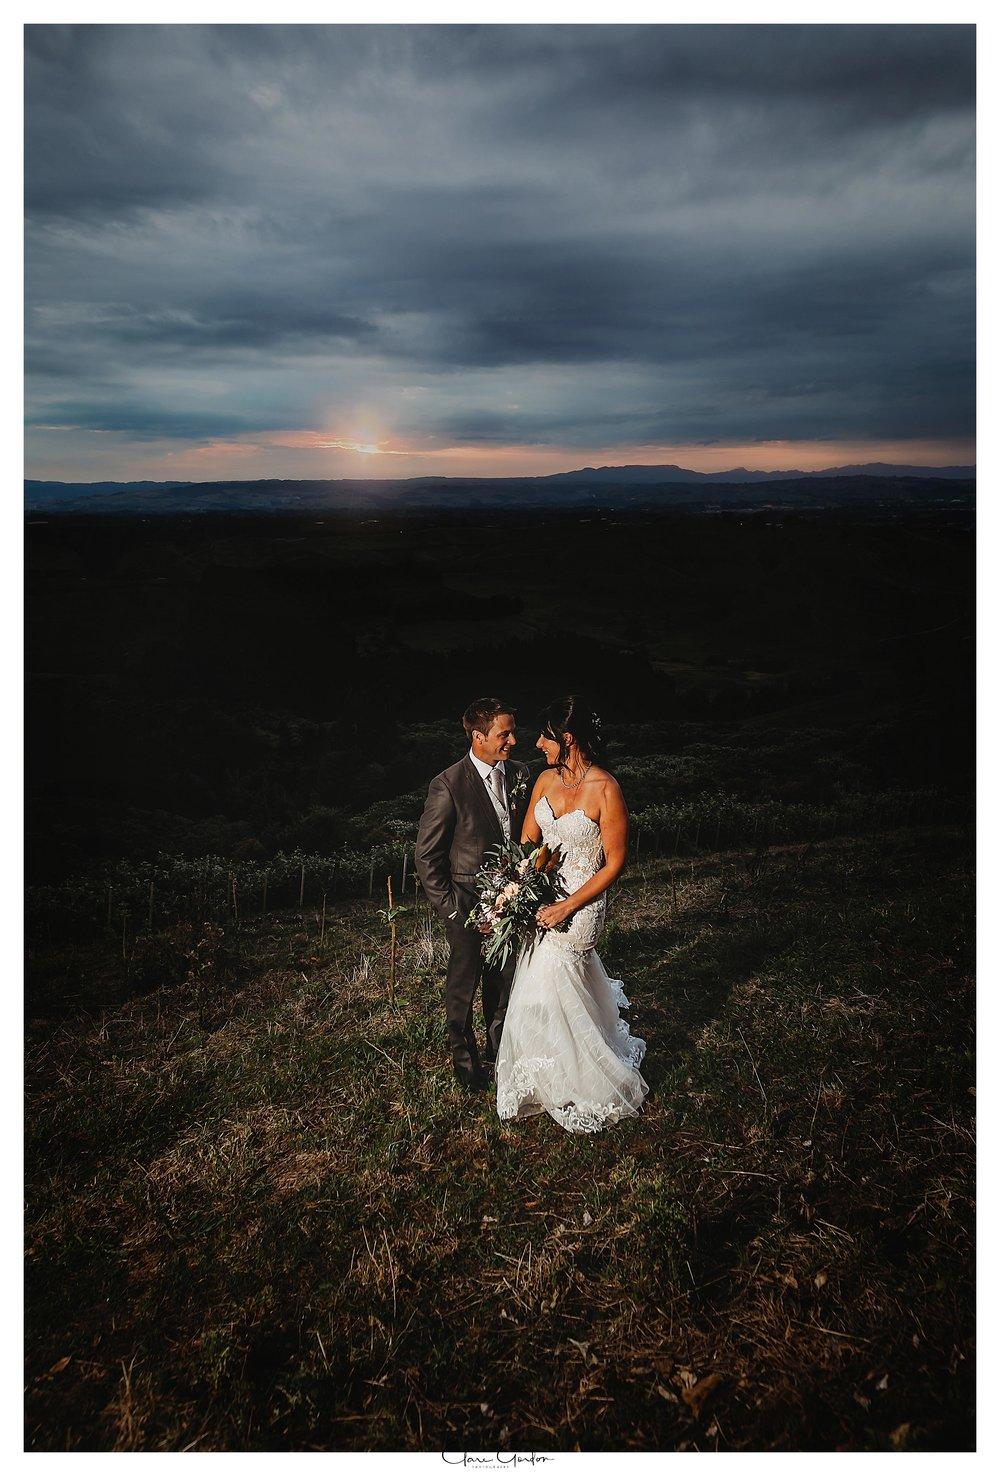 Eagle-ridge-wedding-photo-bride-and-groom-at-sunset